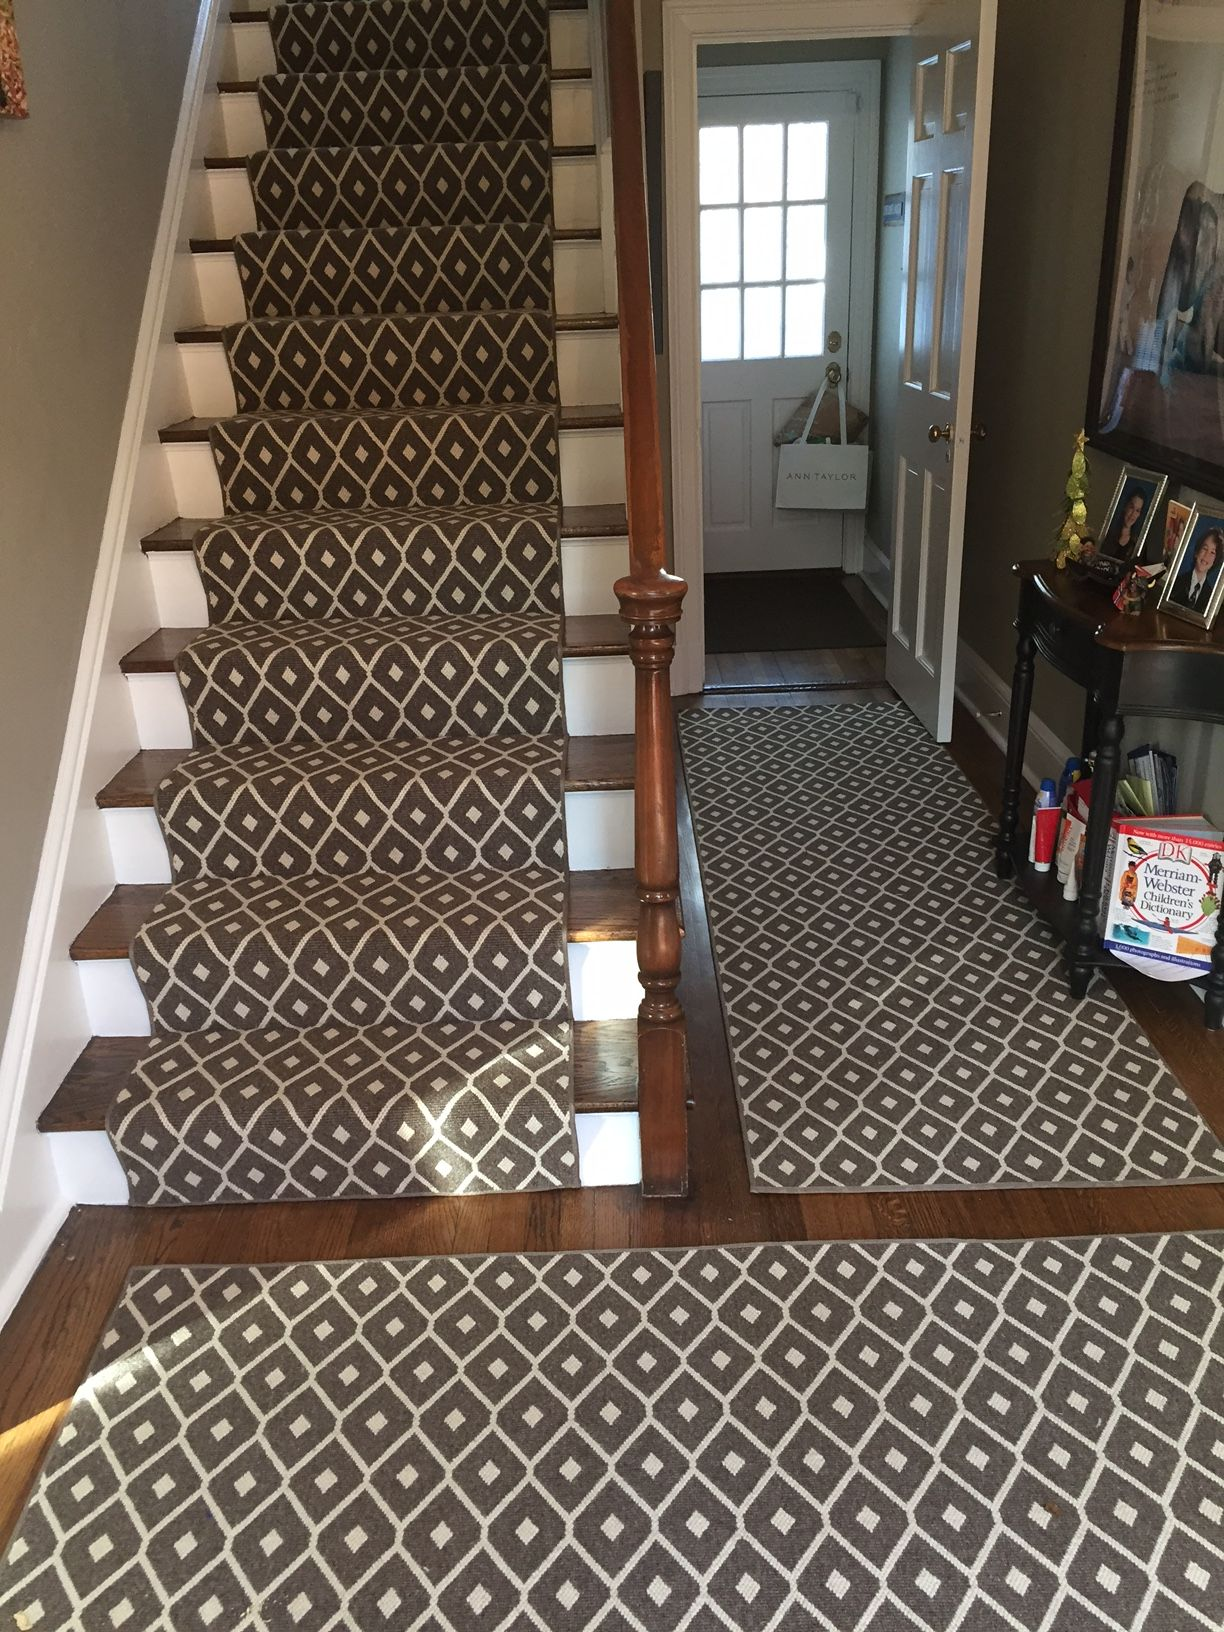 Area Rug Hallway Runner And Step Runner In Patterned Carpet From Stanton Stair Runner Stair Runner Carpet Patterned Carpet